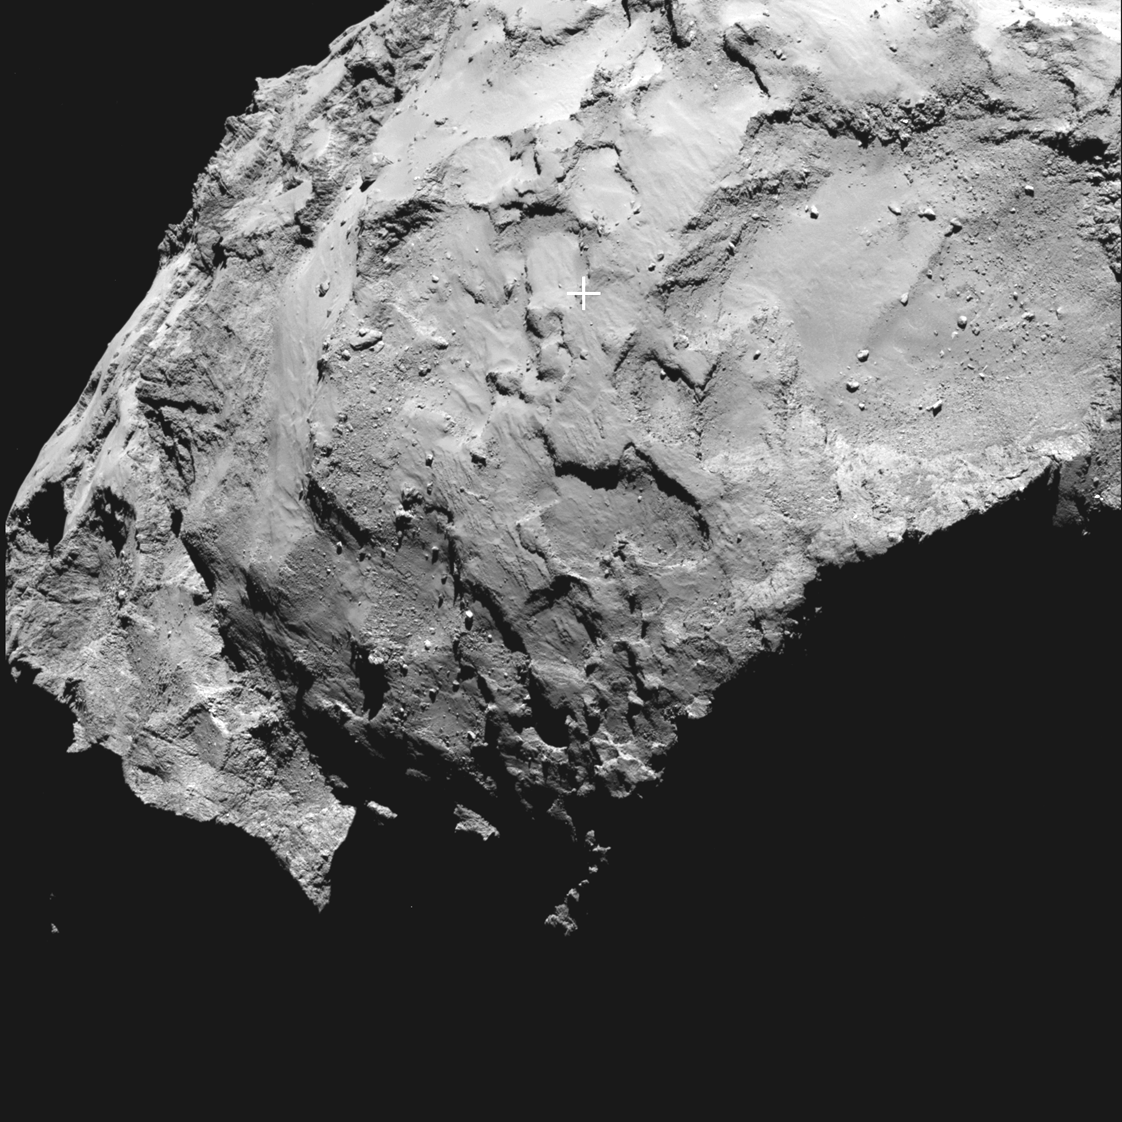 1567216348506-ESA_Rosetta_SiteJ_Overview.png